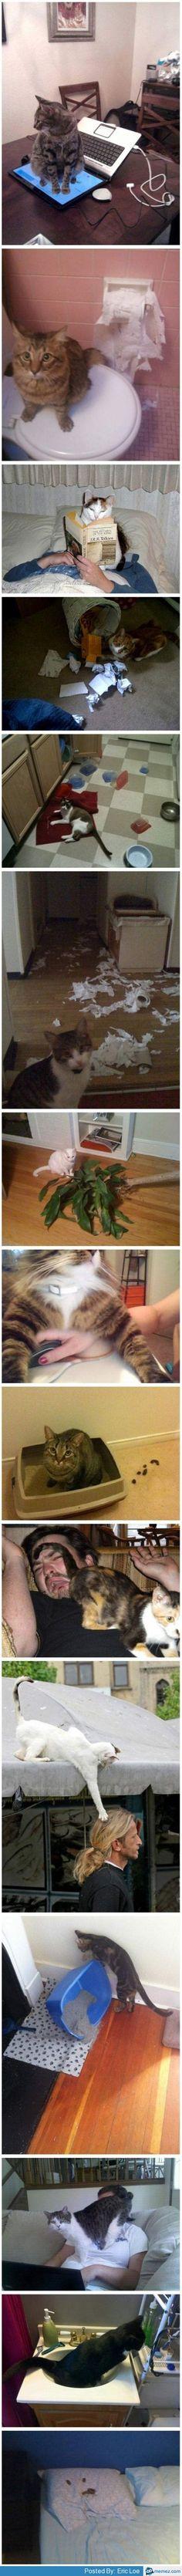 cats...lol